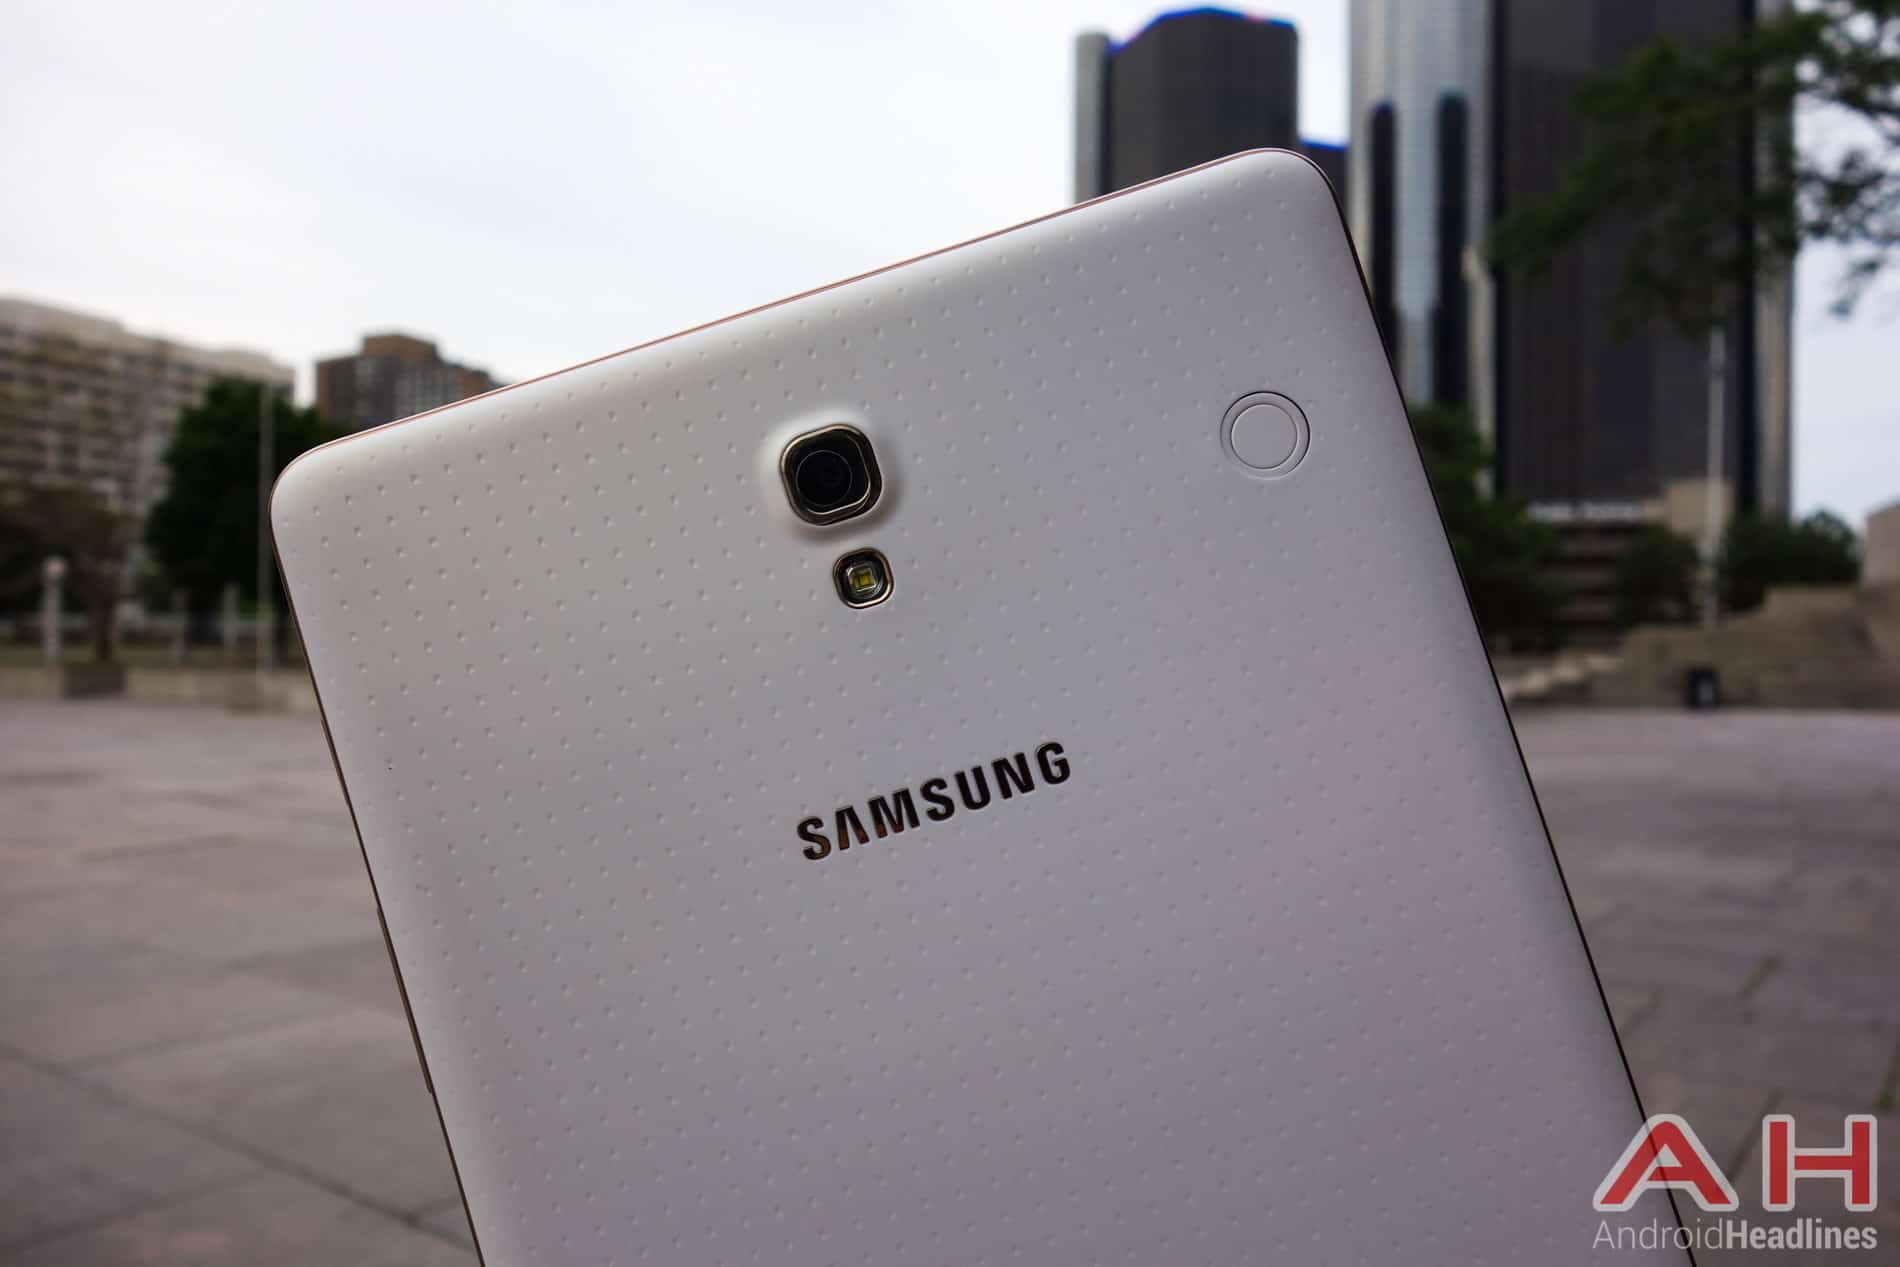 Samsung-Galaxy-Tab-S-AH-3-2